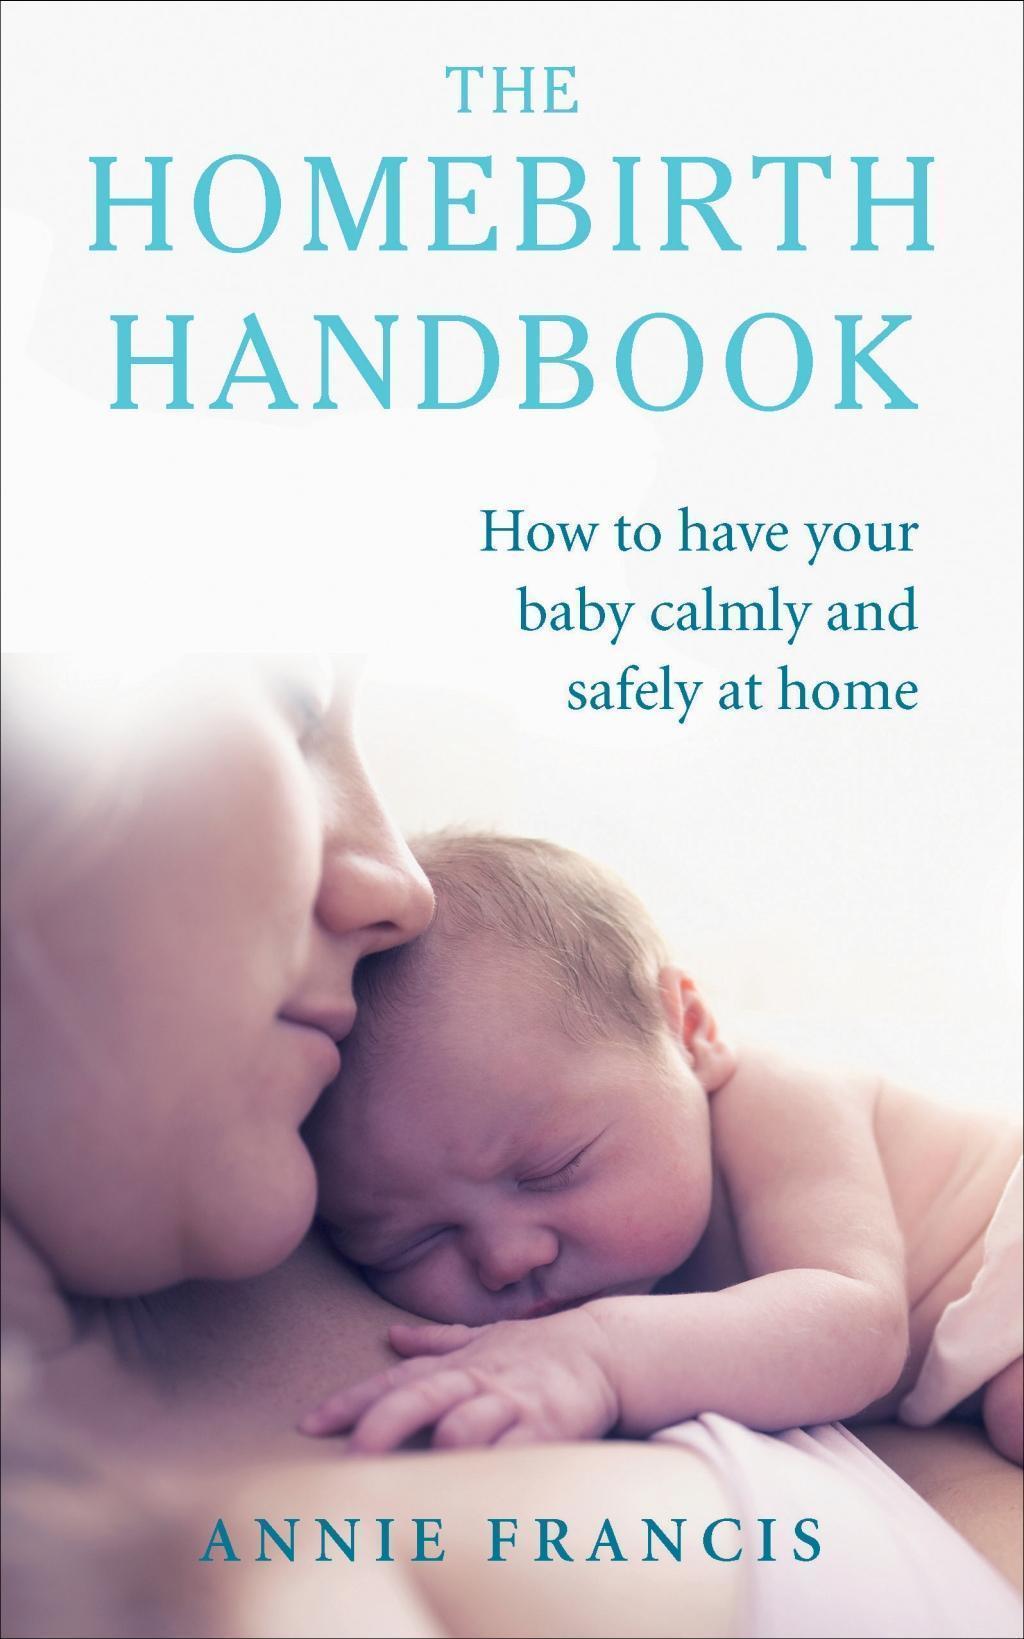 The Homebirth Handbook